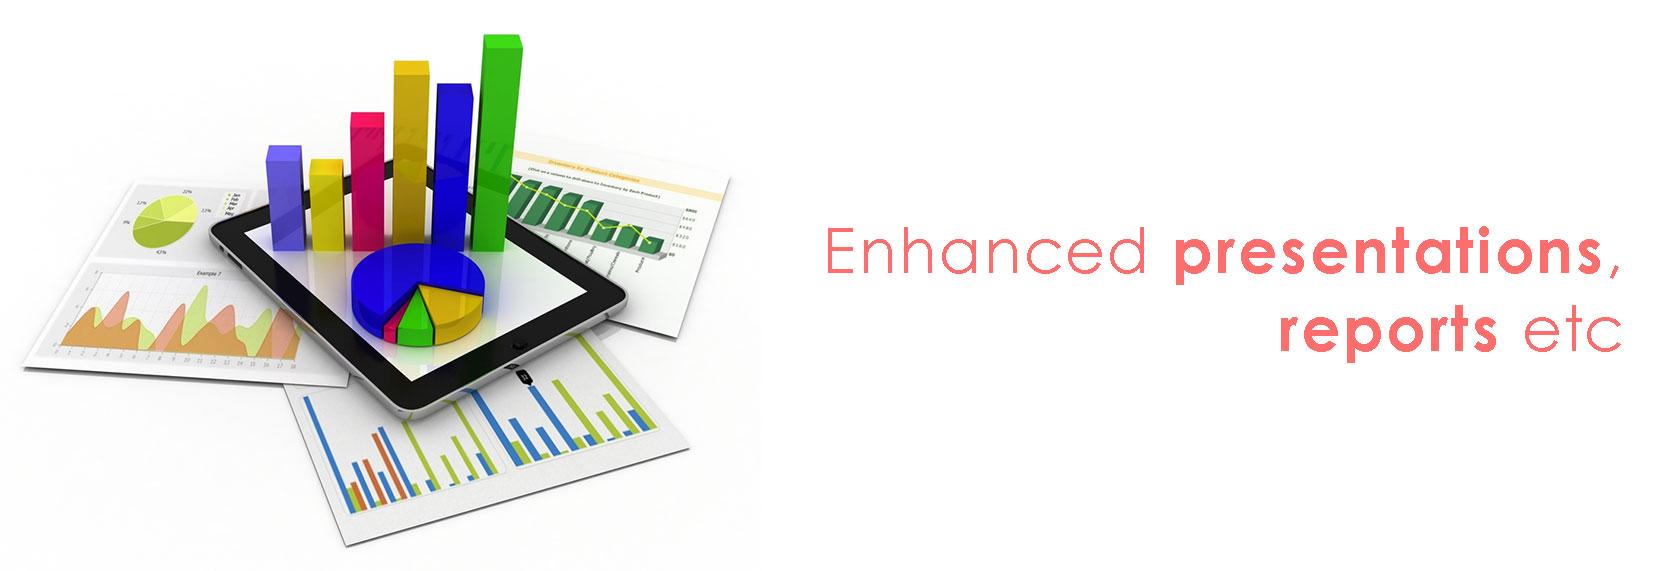 Enhanced presentations, reports etc.